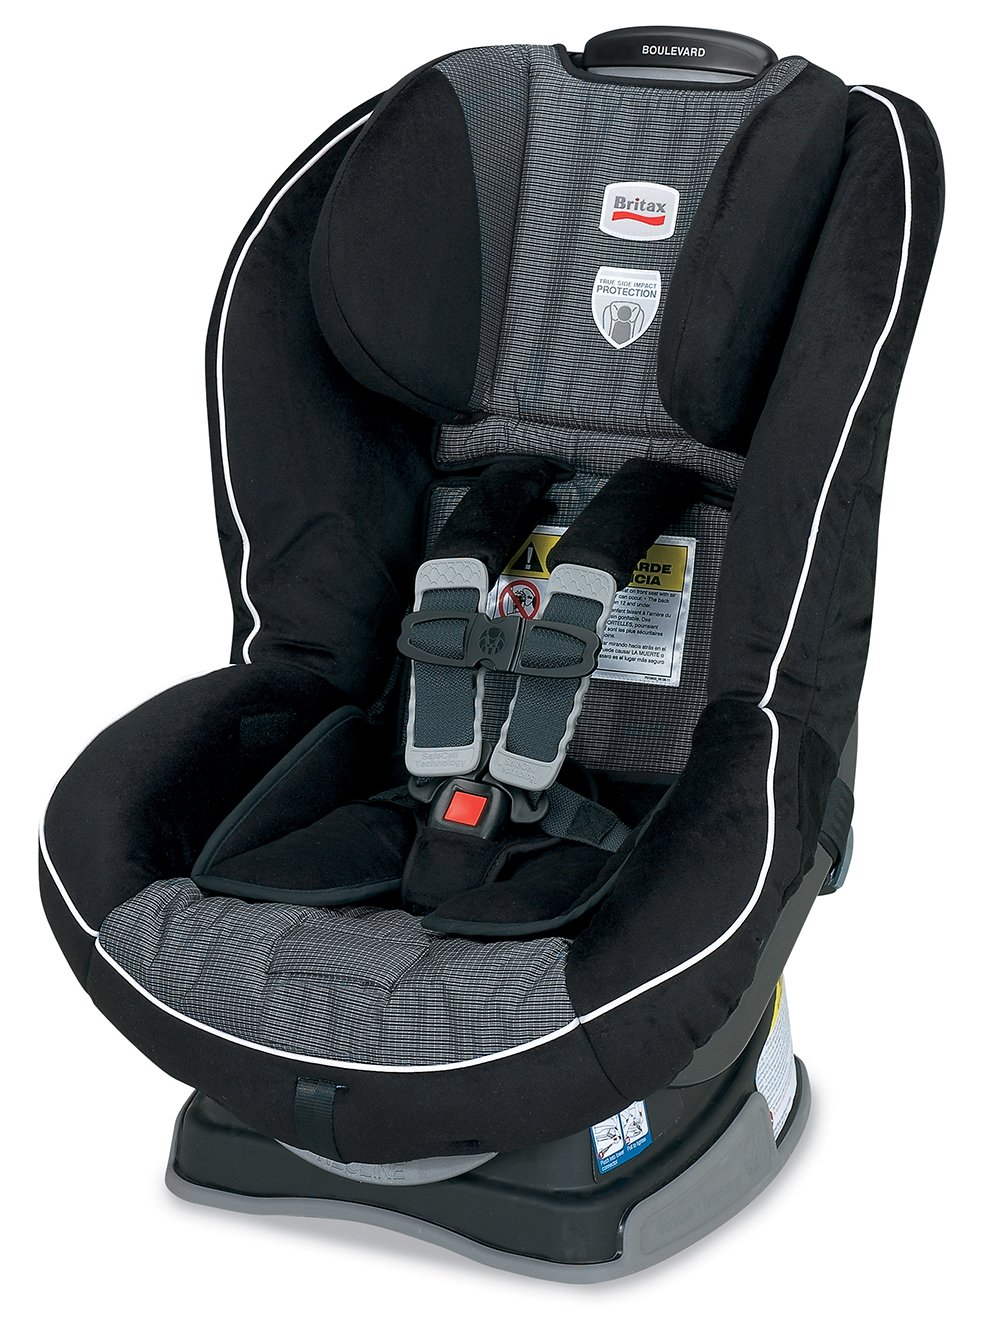 britax boulevard g4 1 convertible car seat  Amazon.com : Britax Boulevard G4 Convertible Car Seat, Onyx (Prior ...